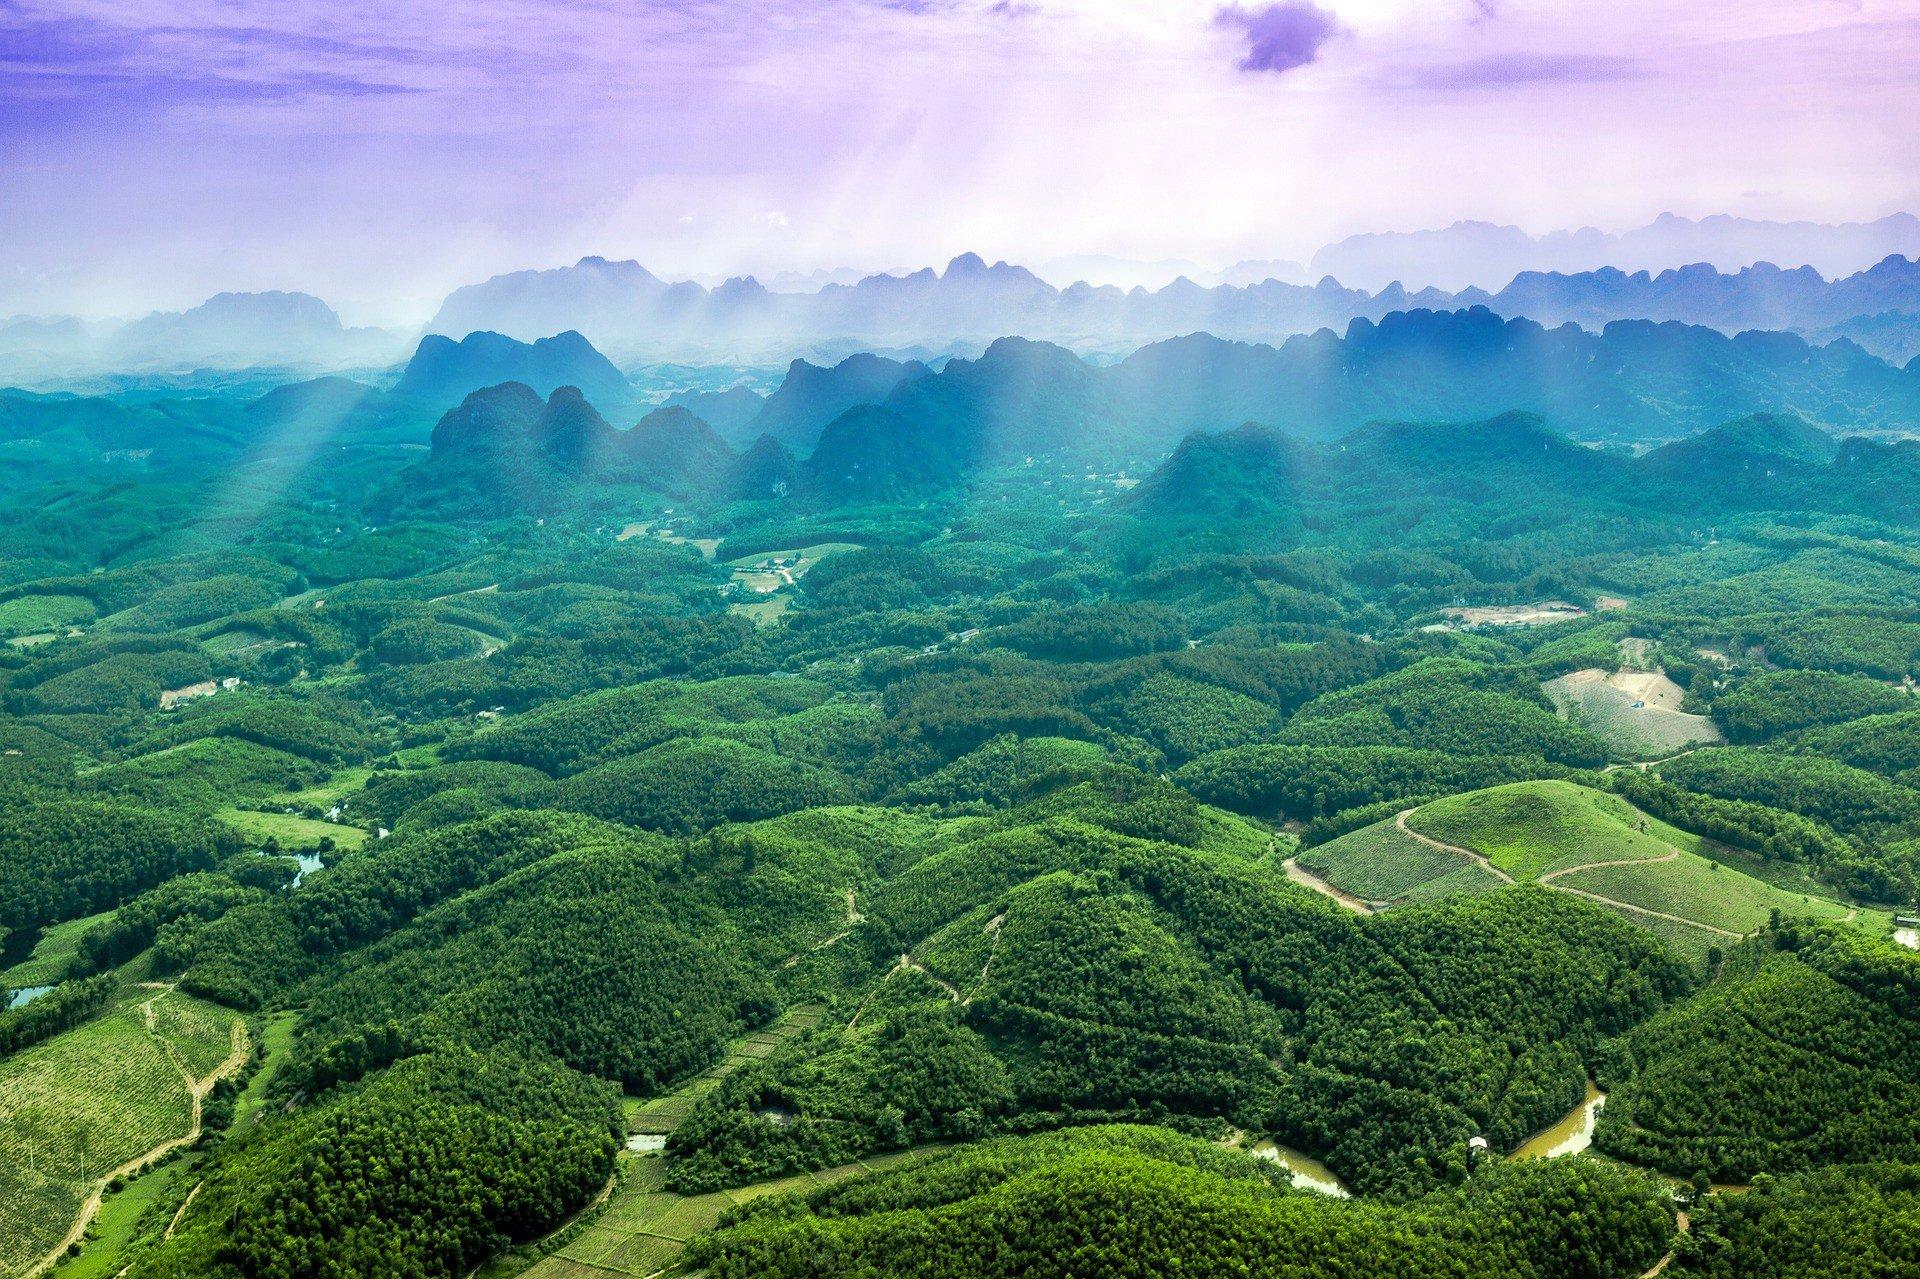 Scenery in Ninh Binh Province